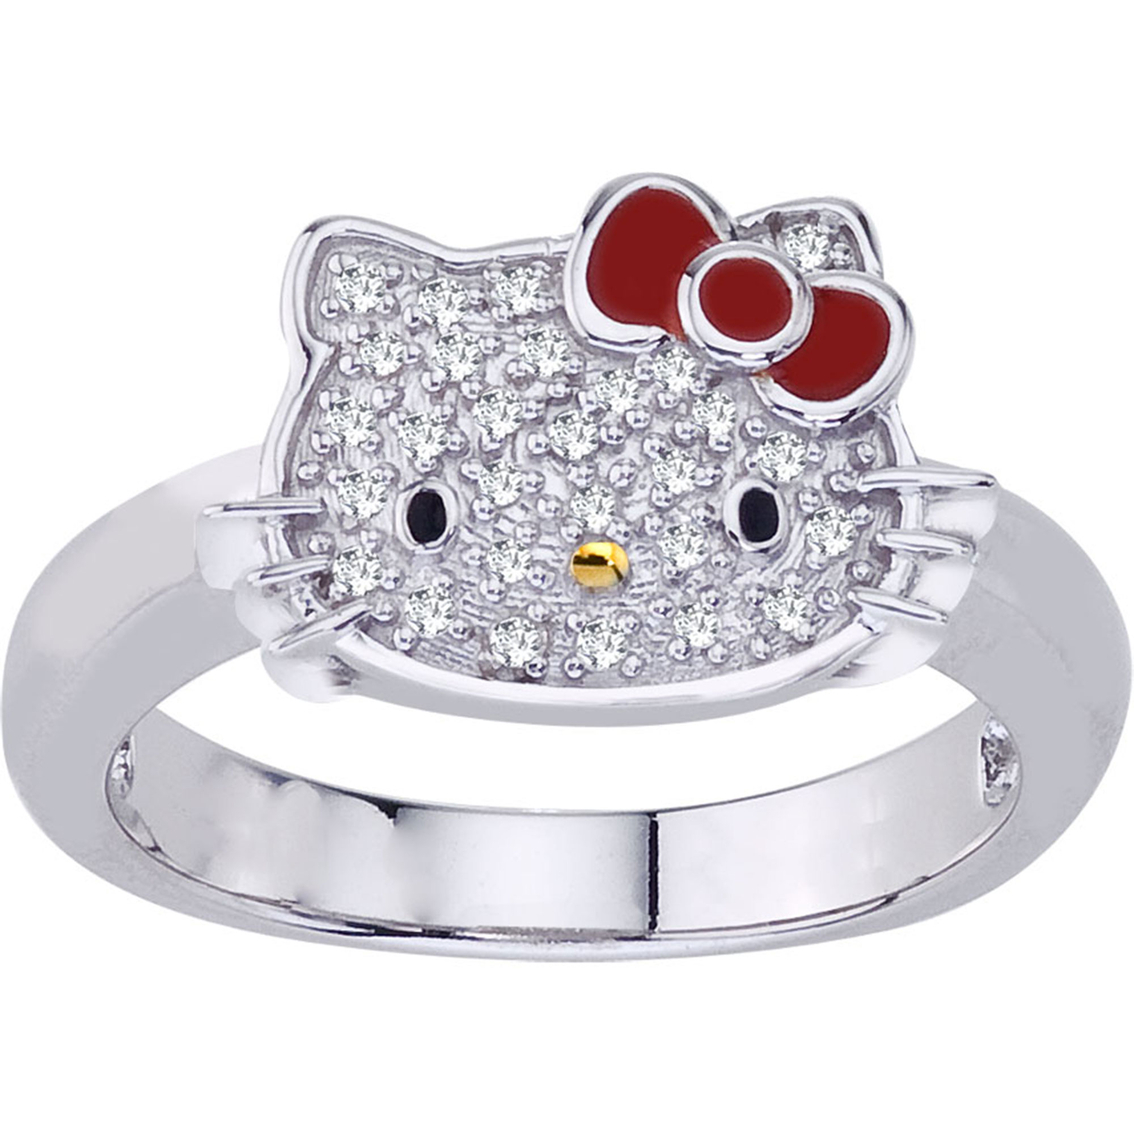 6430 - Hello Kitty Wedding Ring